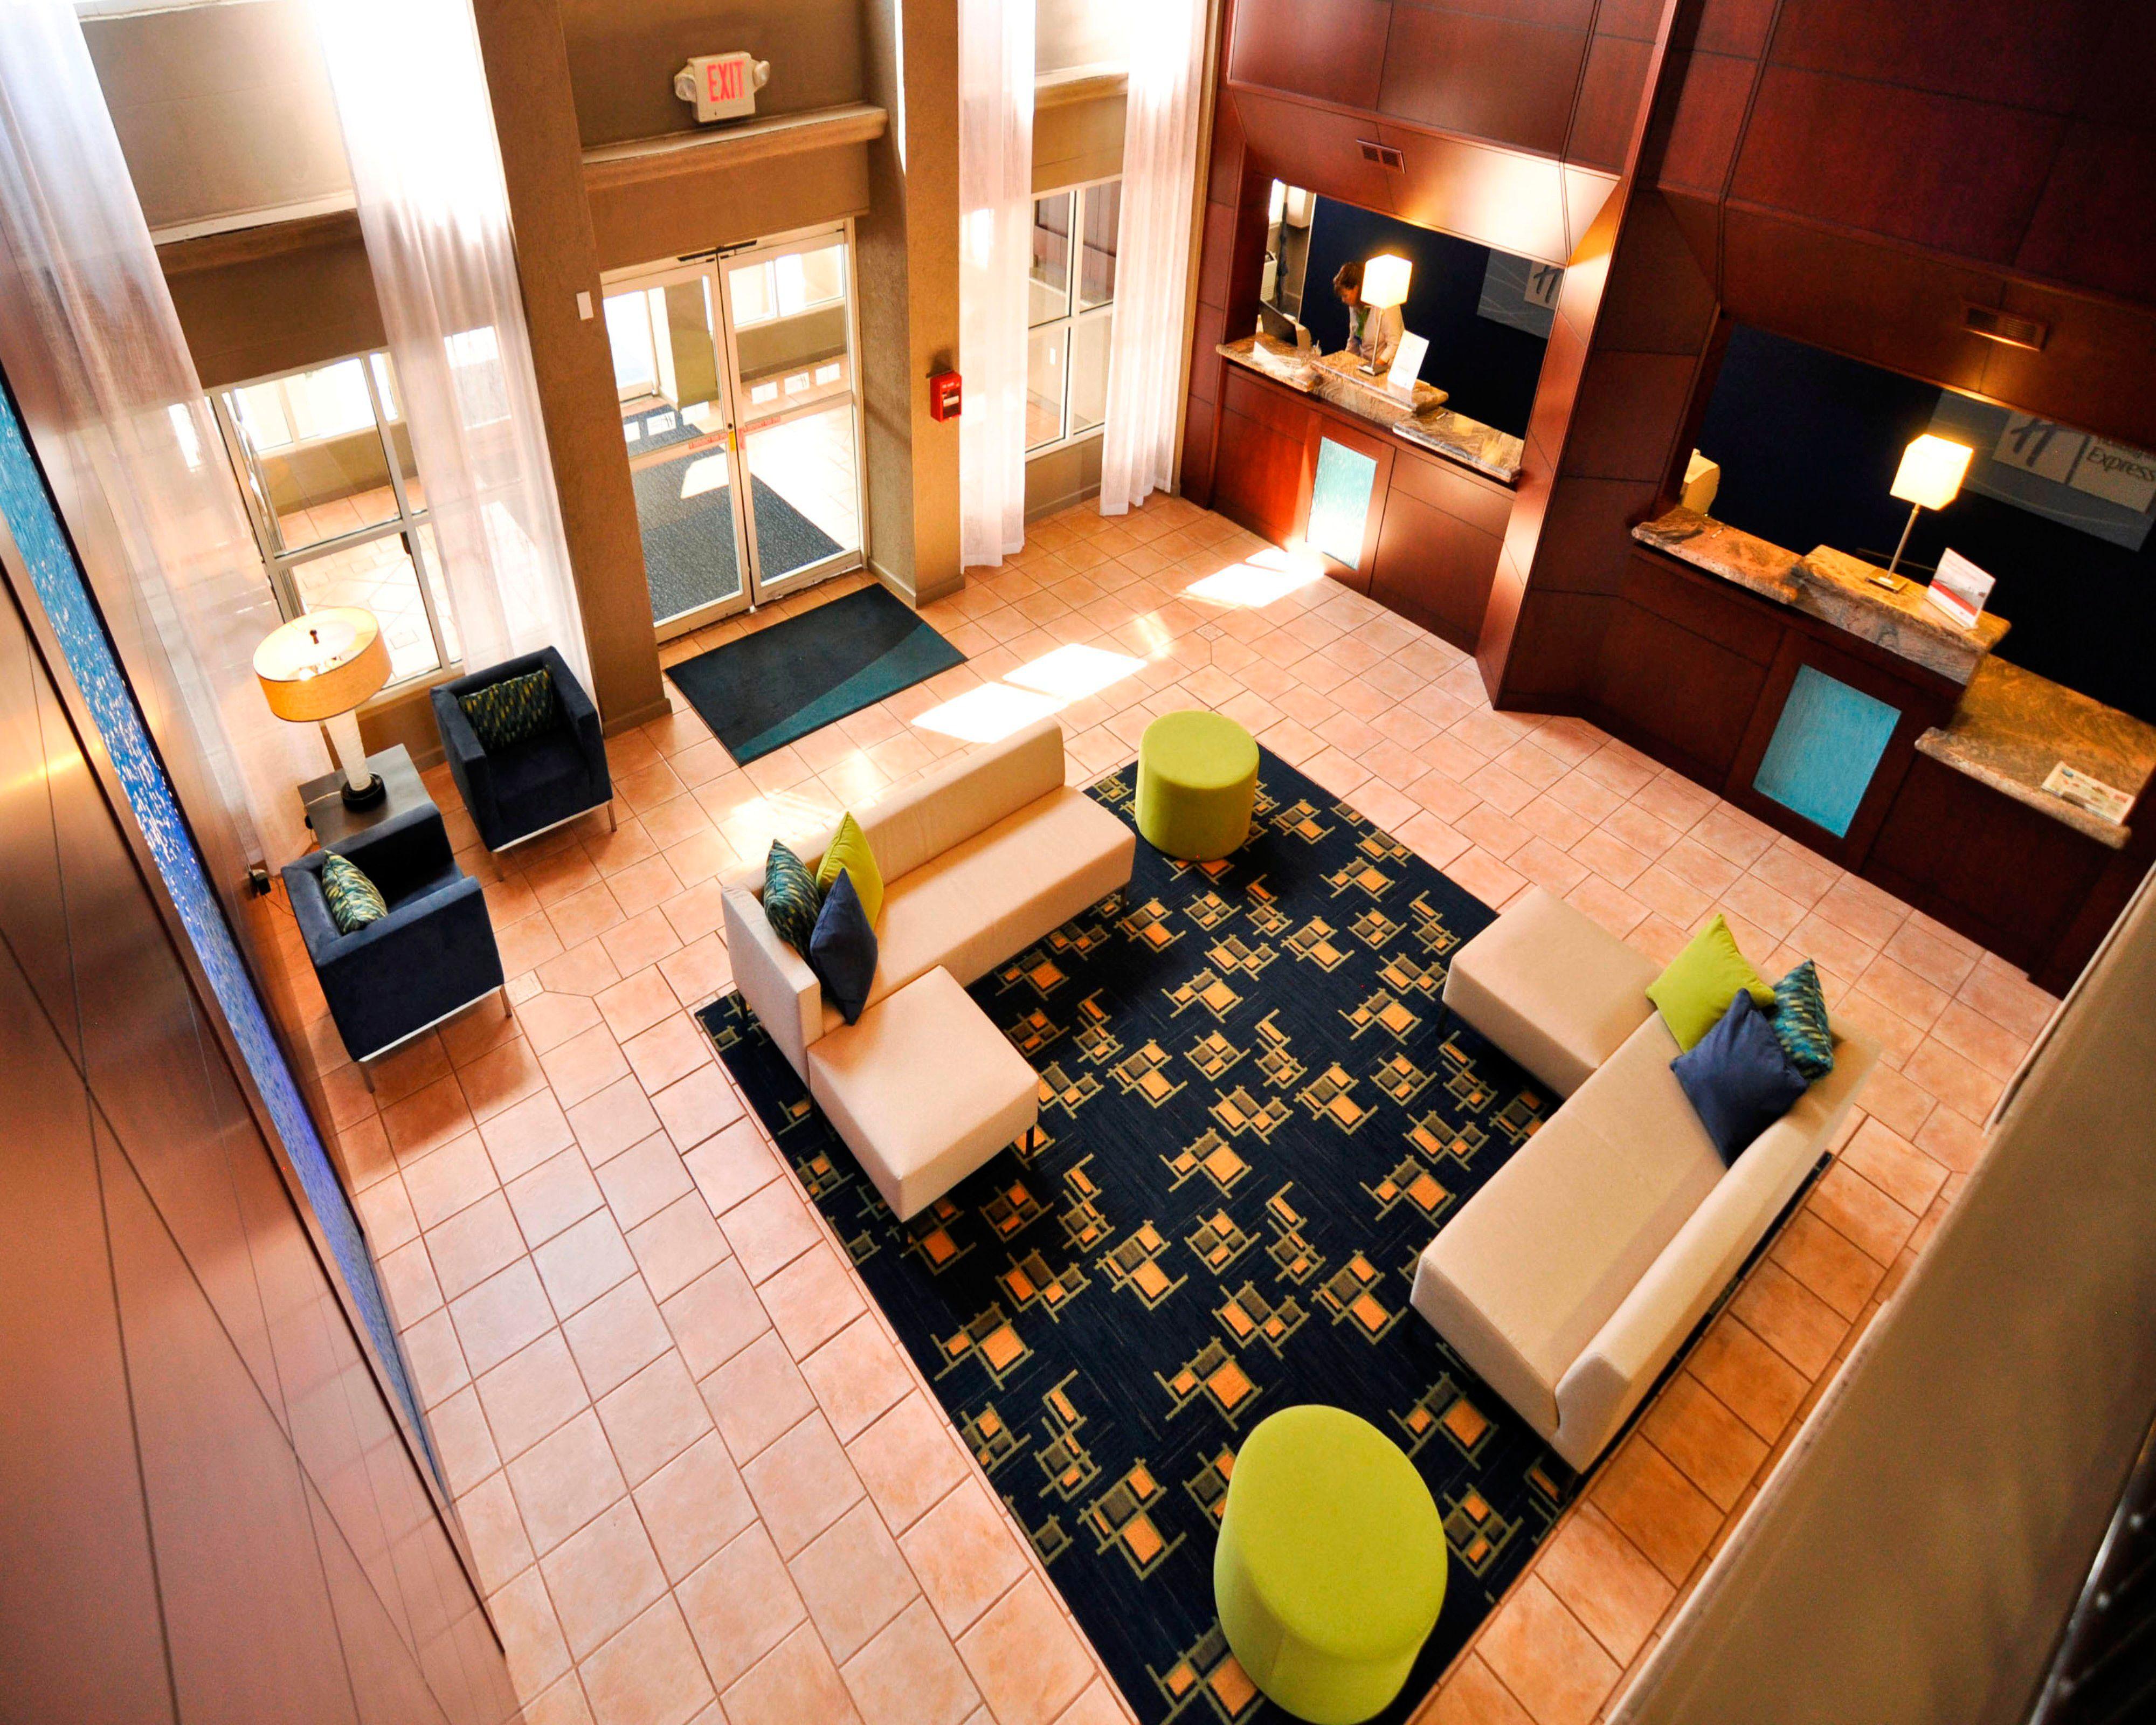 Holiday Inn Express & Suites Port Clinton-Catawba Island image 5